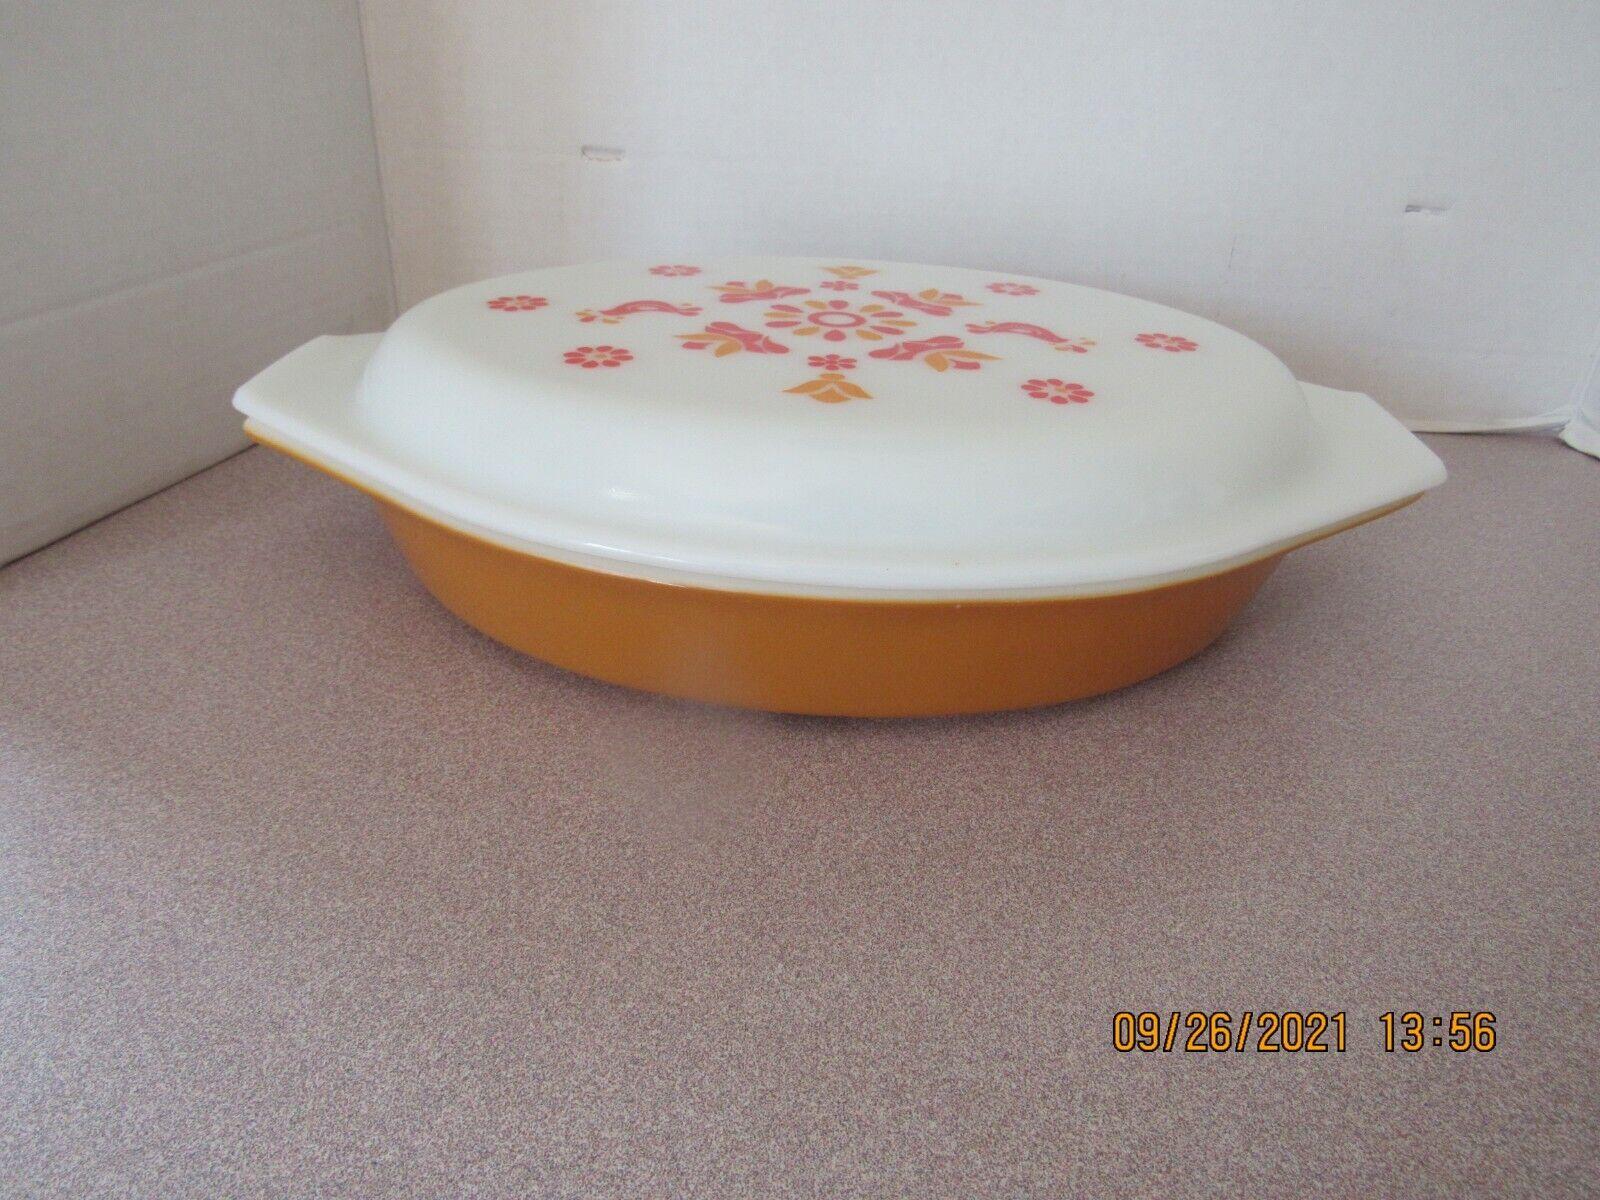 Vintage Pyrex Friendship Casserole Divided Dish W/Lid Orange Red Flowers Birds - $19.99